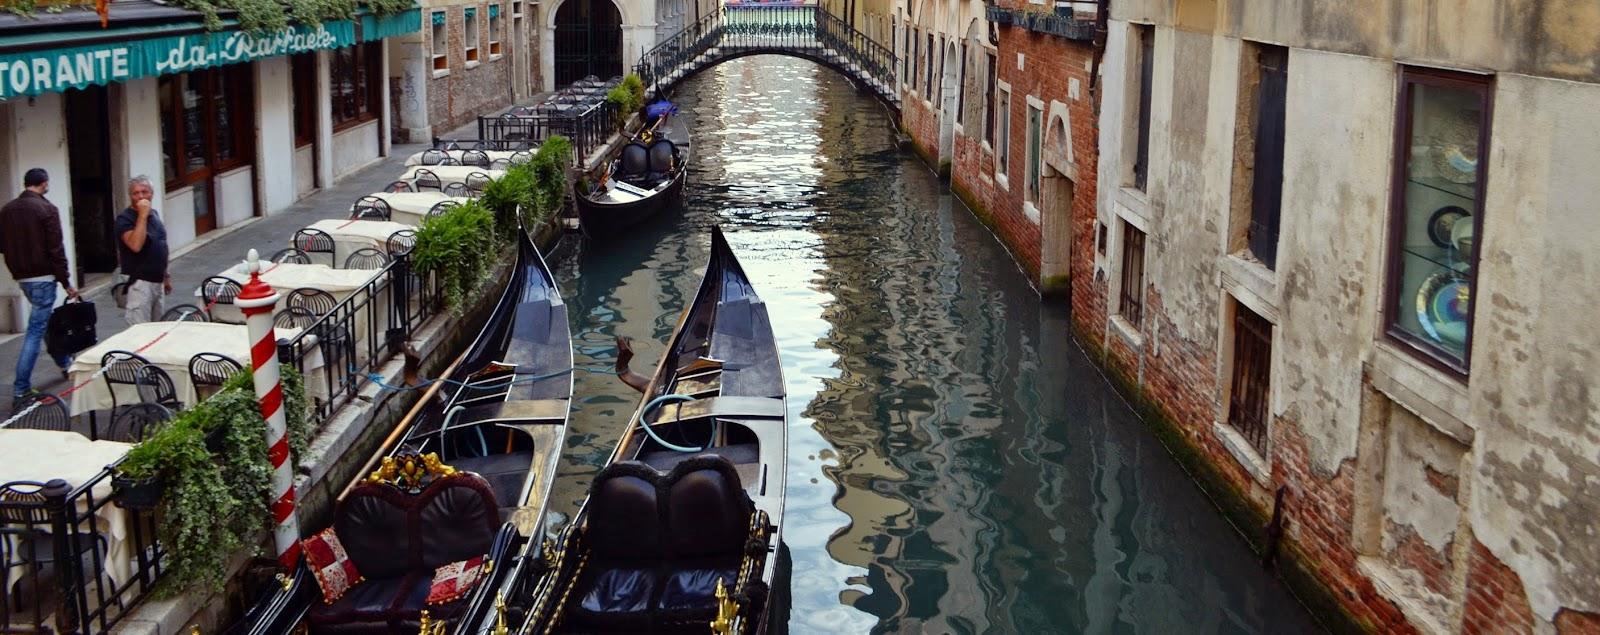 Venice, Italy, venezia, canals , europe, gondola, St mark's square, restaurant